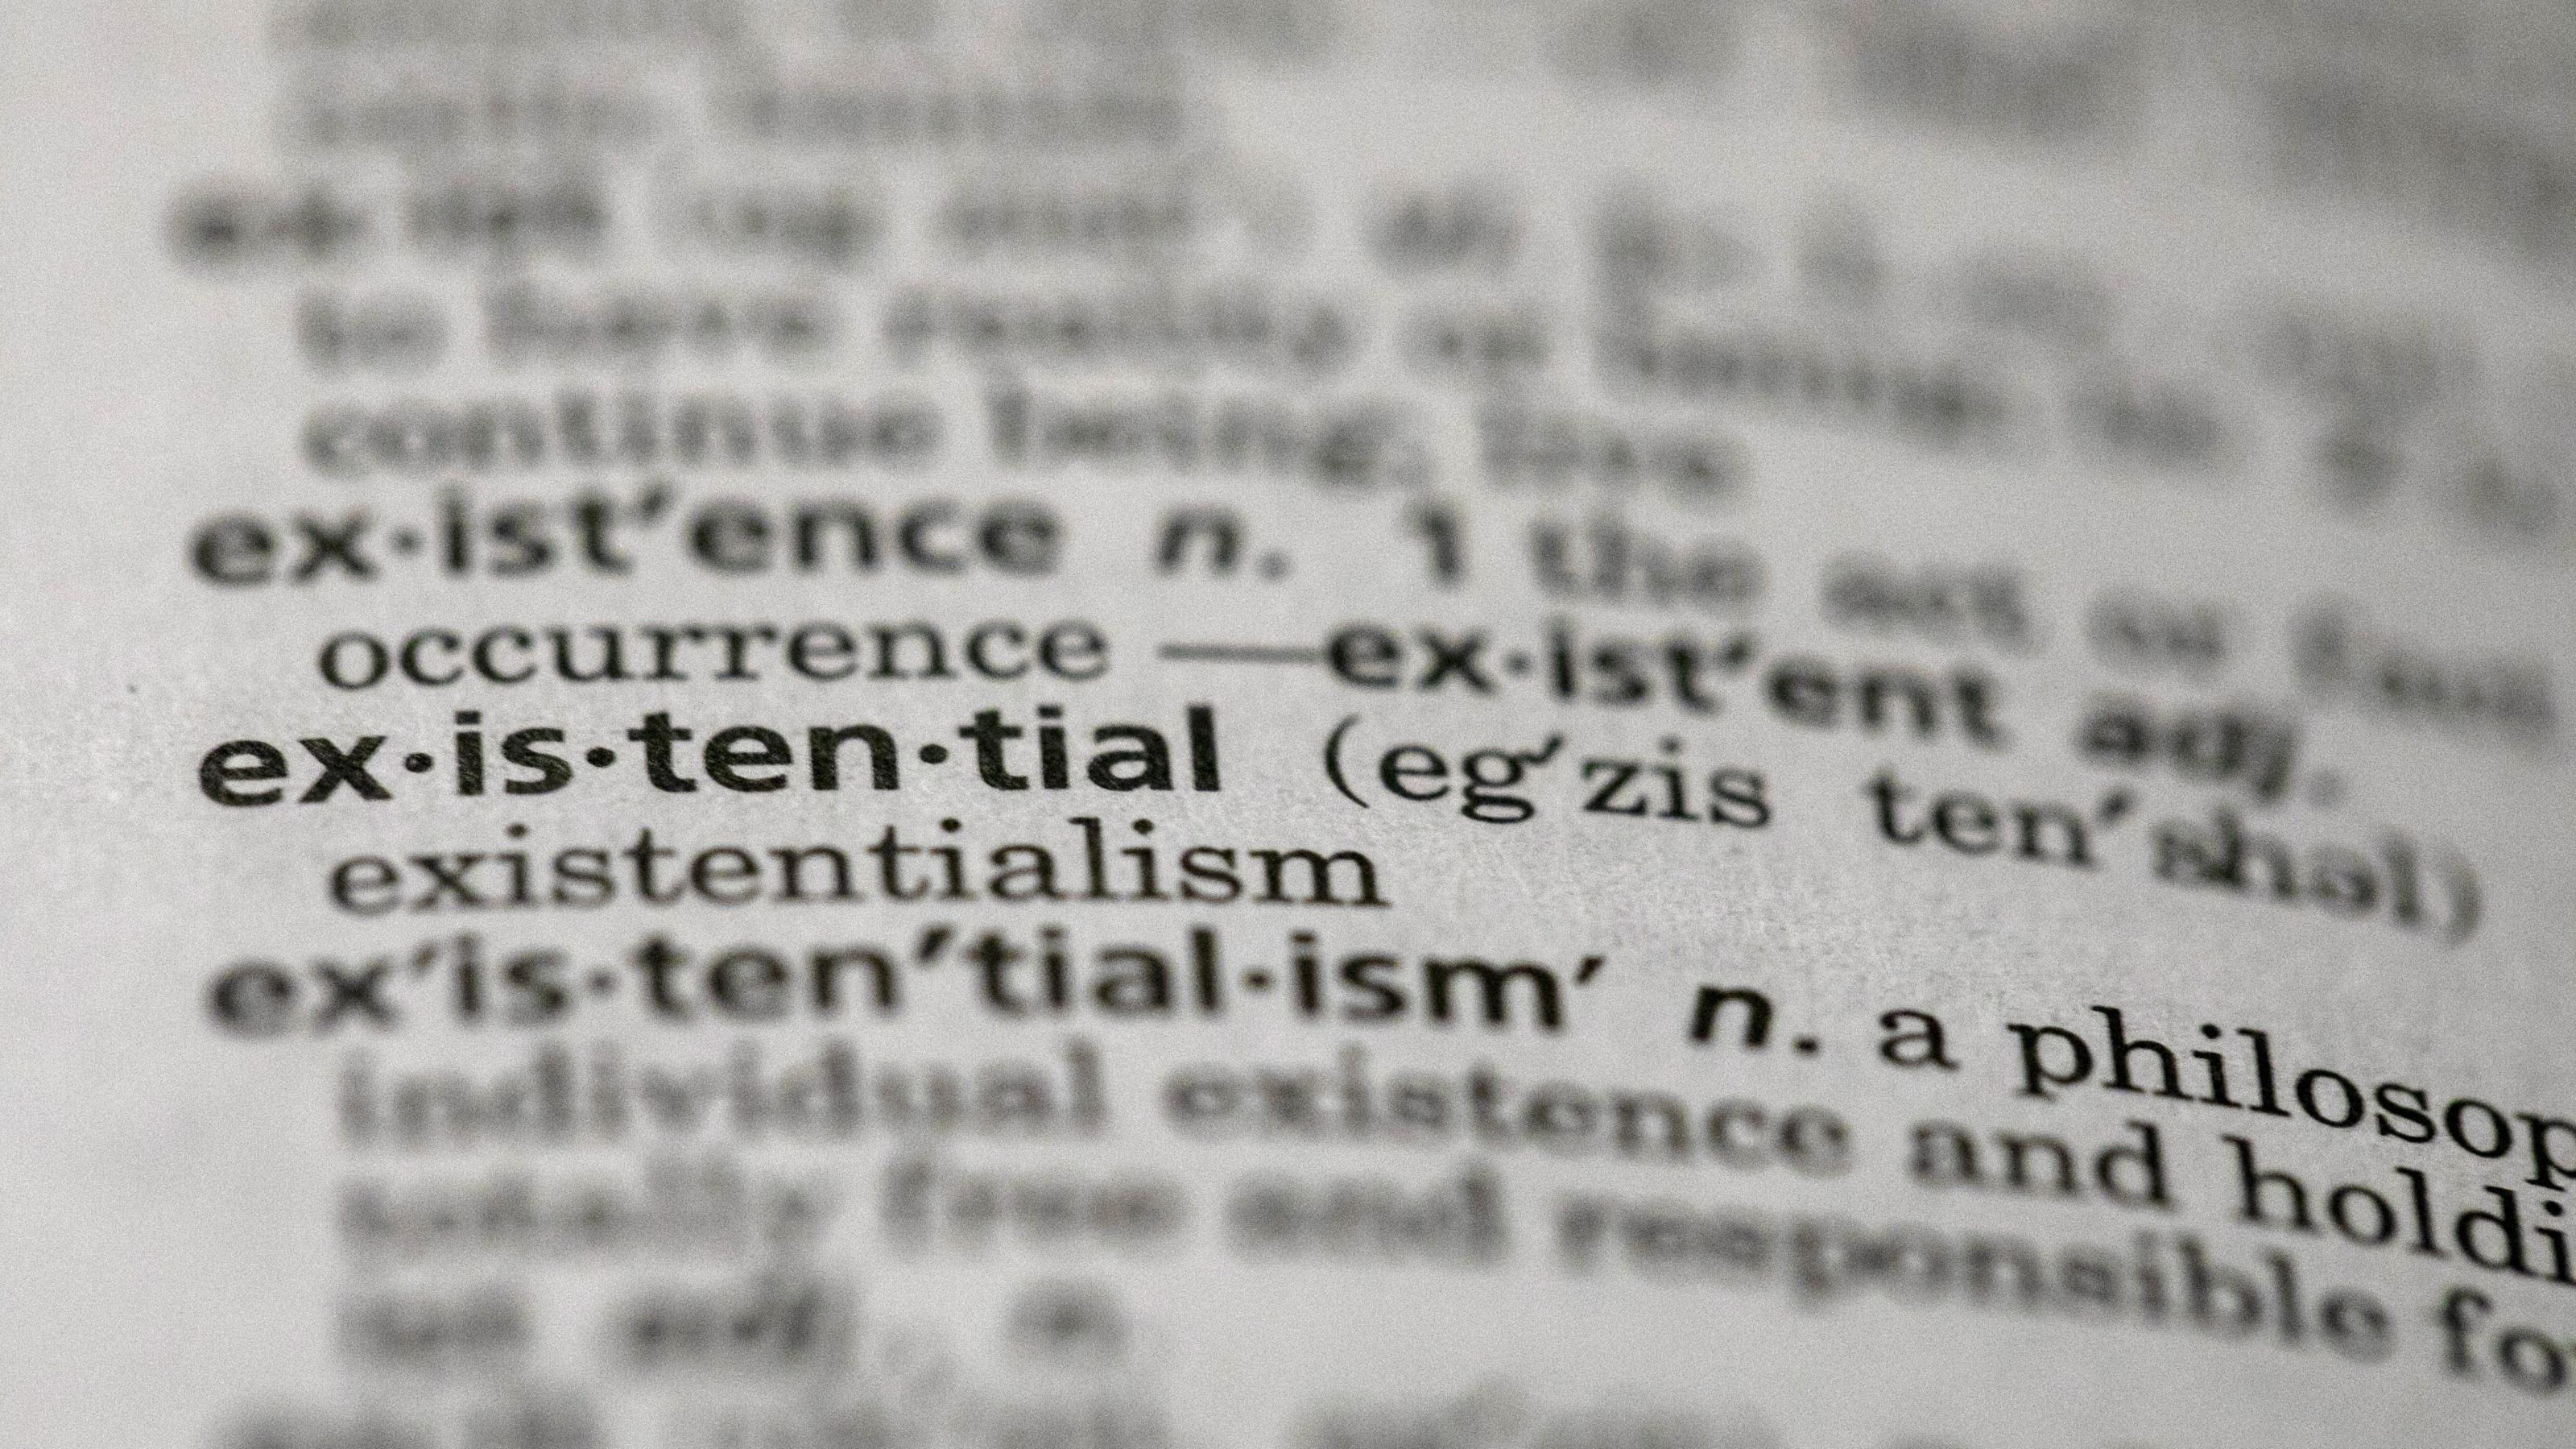 Woke, lit, snacc: What Gen Z's Tinder lingo means to millennials